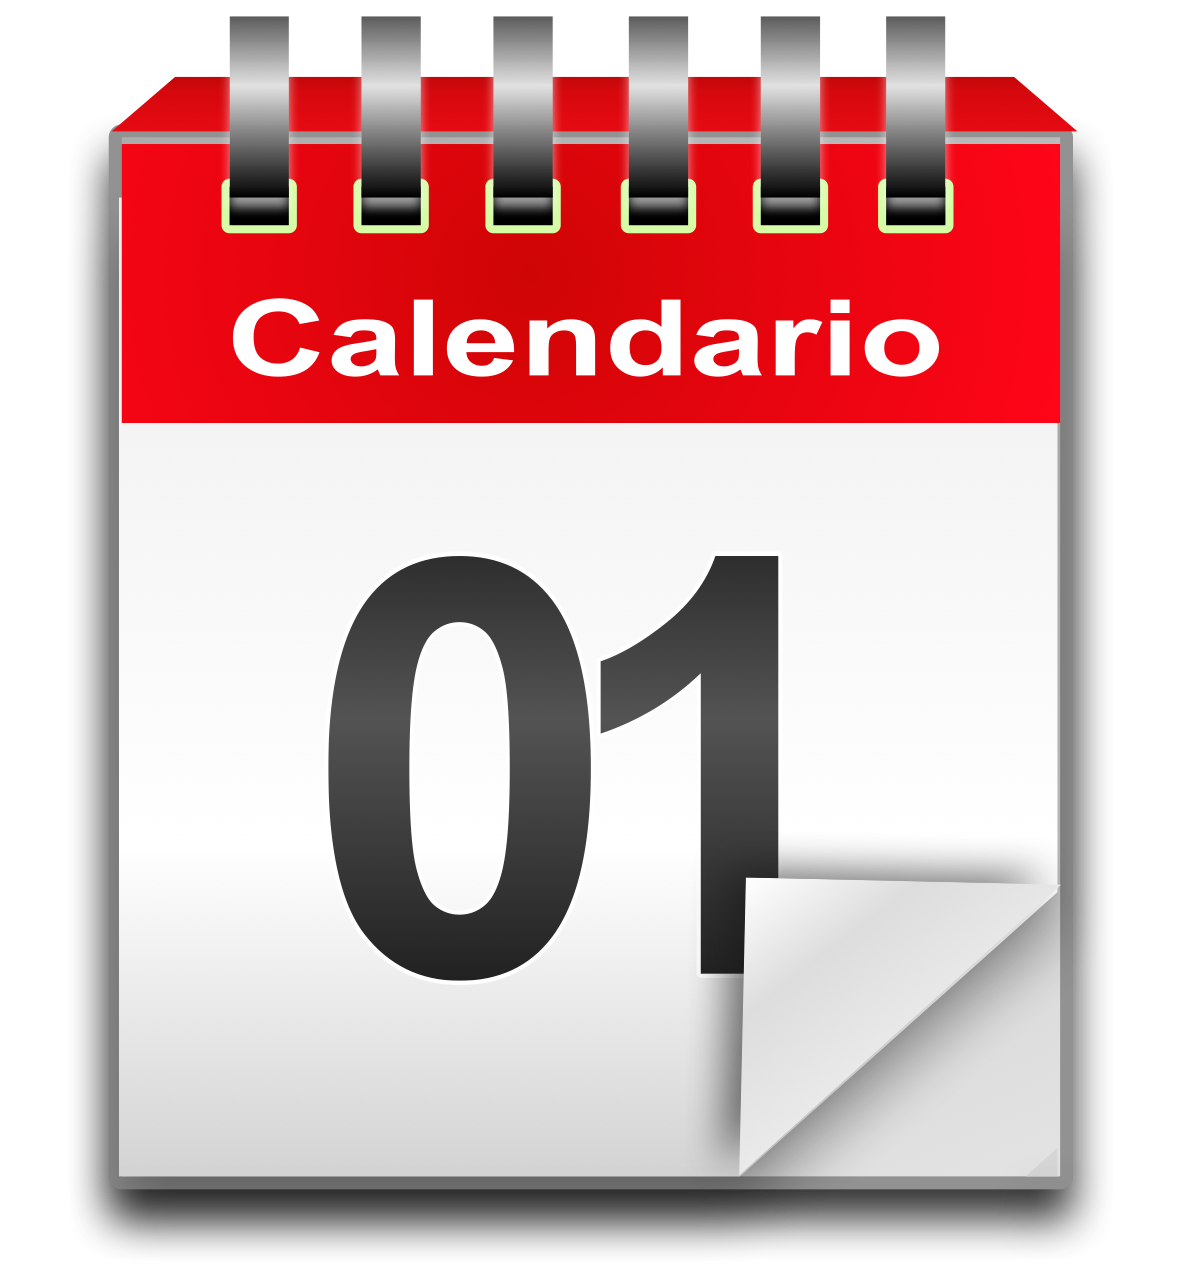 Mi calendario 2015 v monos for Calendario 2015 ministerio del interior